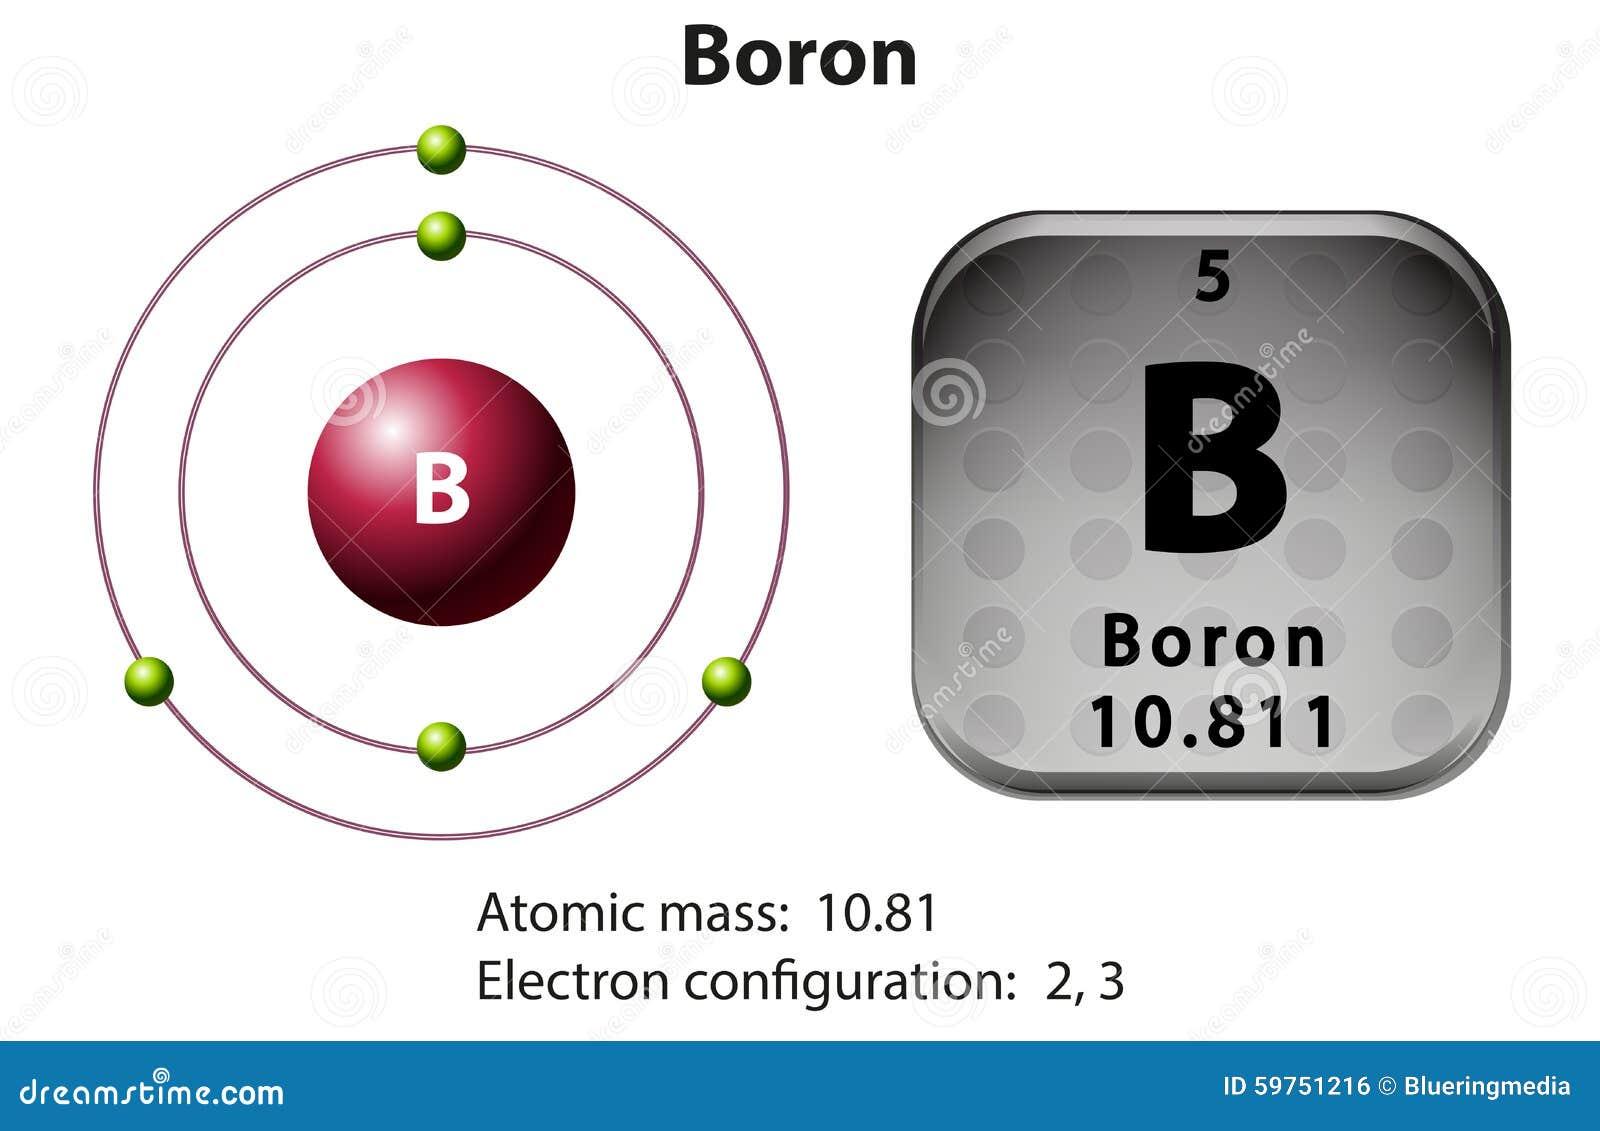 Boron stock illustrations 260 boron stock illustrations vectors symbol and electron diagram boron illustration royalty free illustration ccuart Images